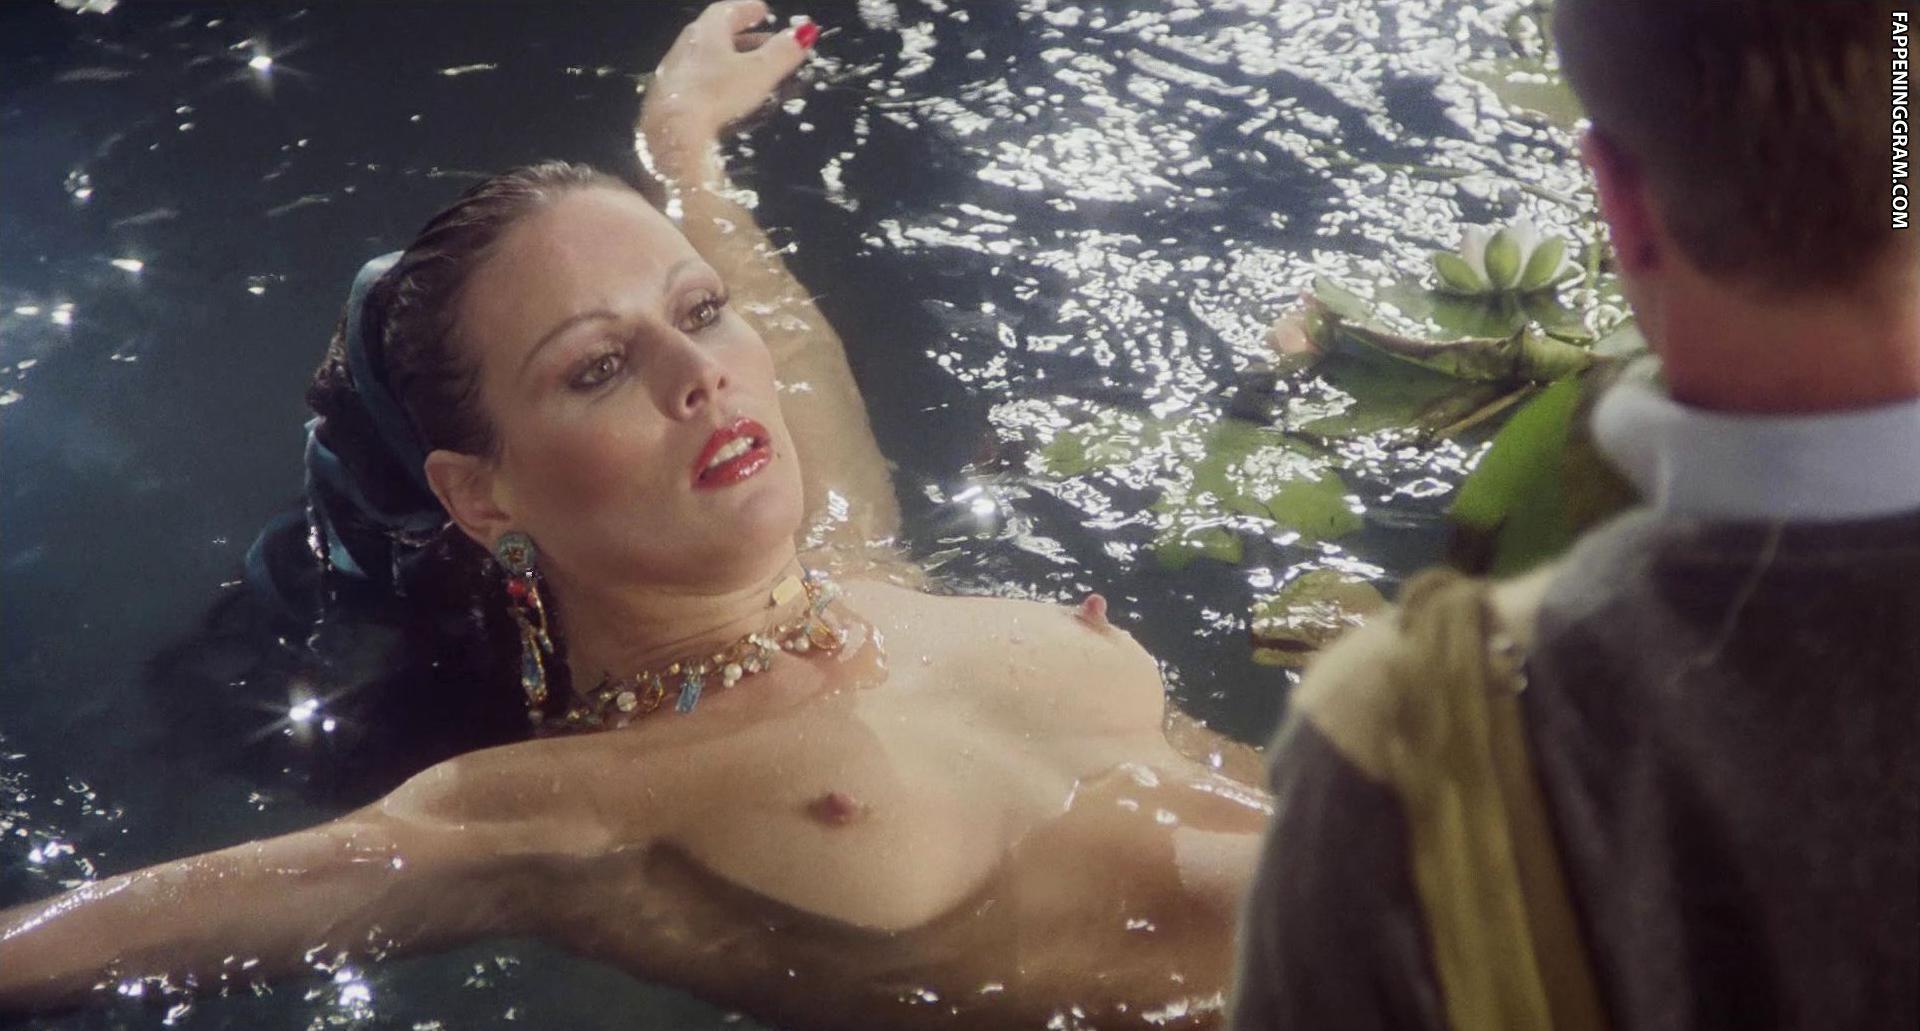 Jewel Staite Free Nude Celebrities